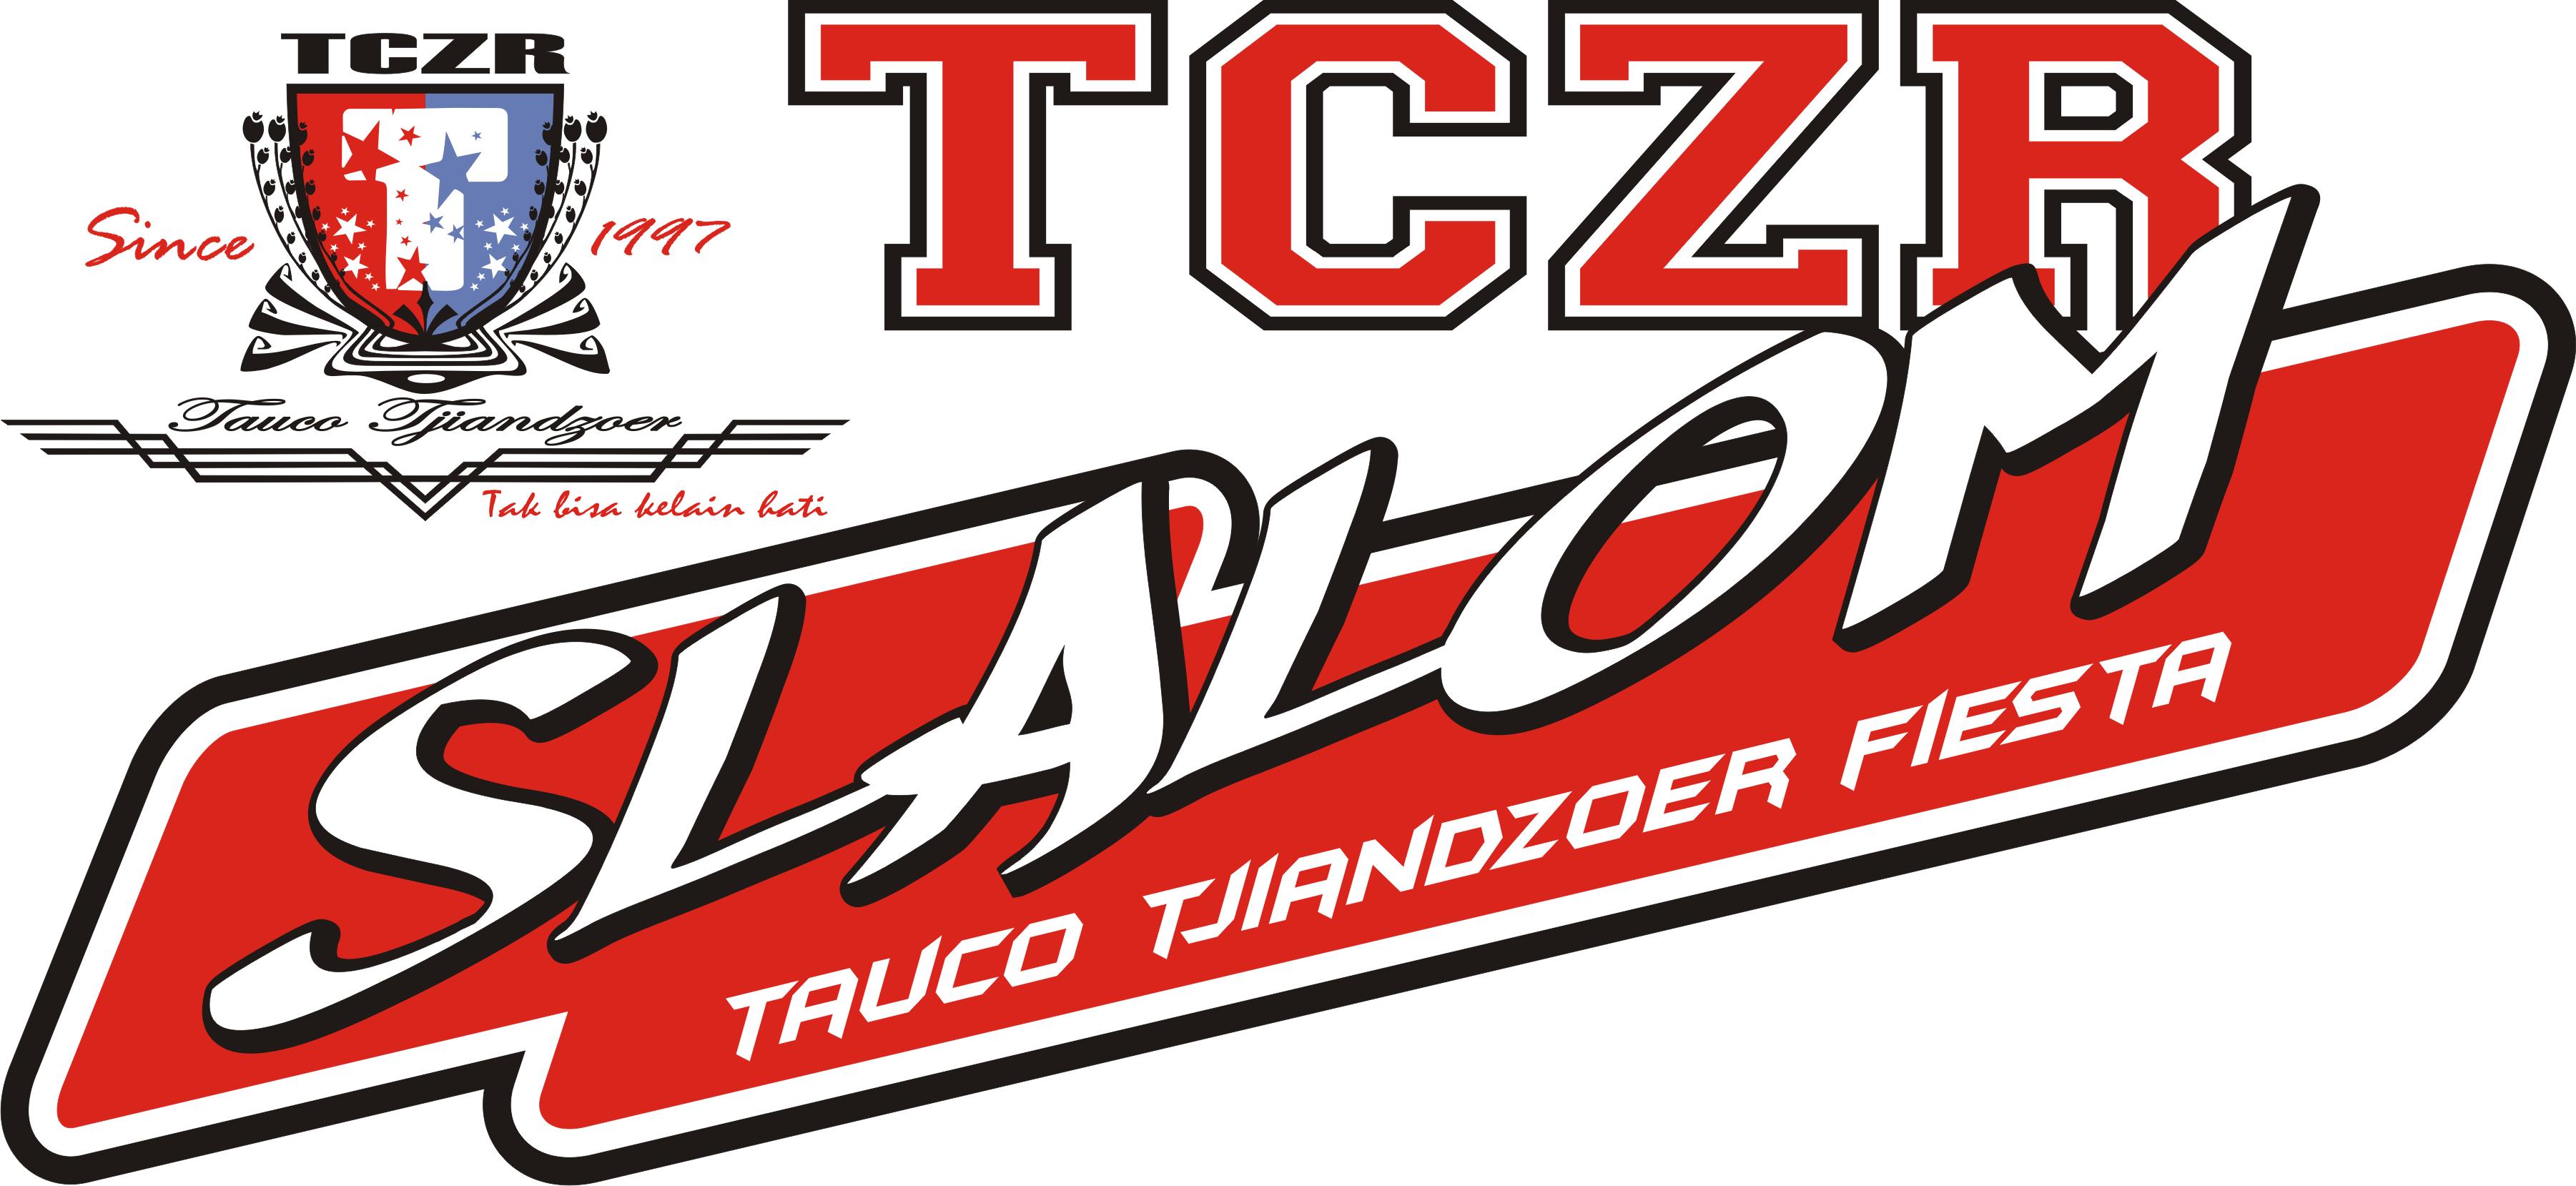 Logo slalom tczr1 png